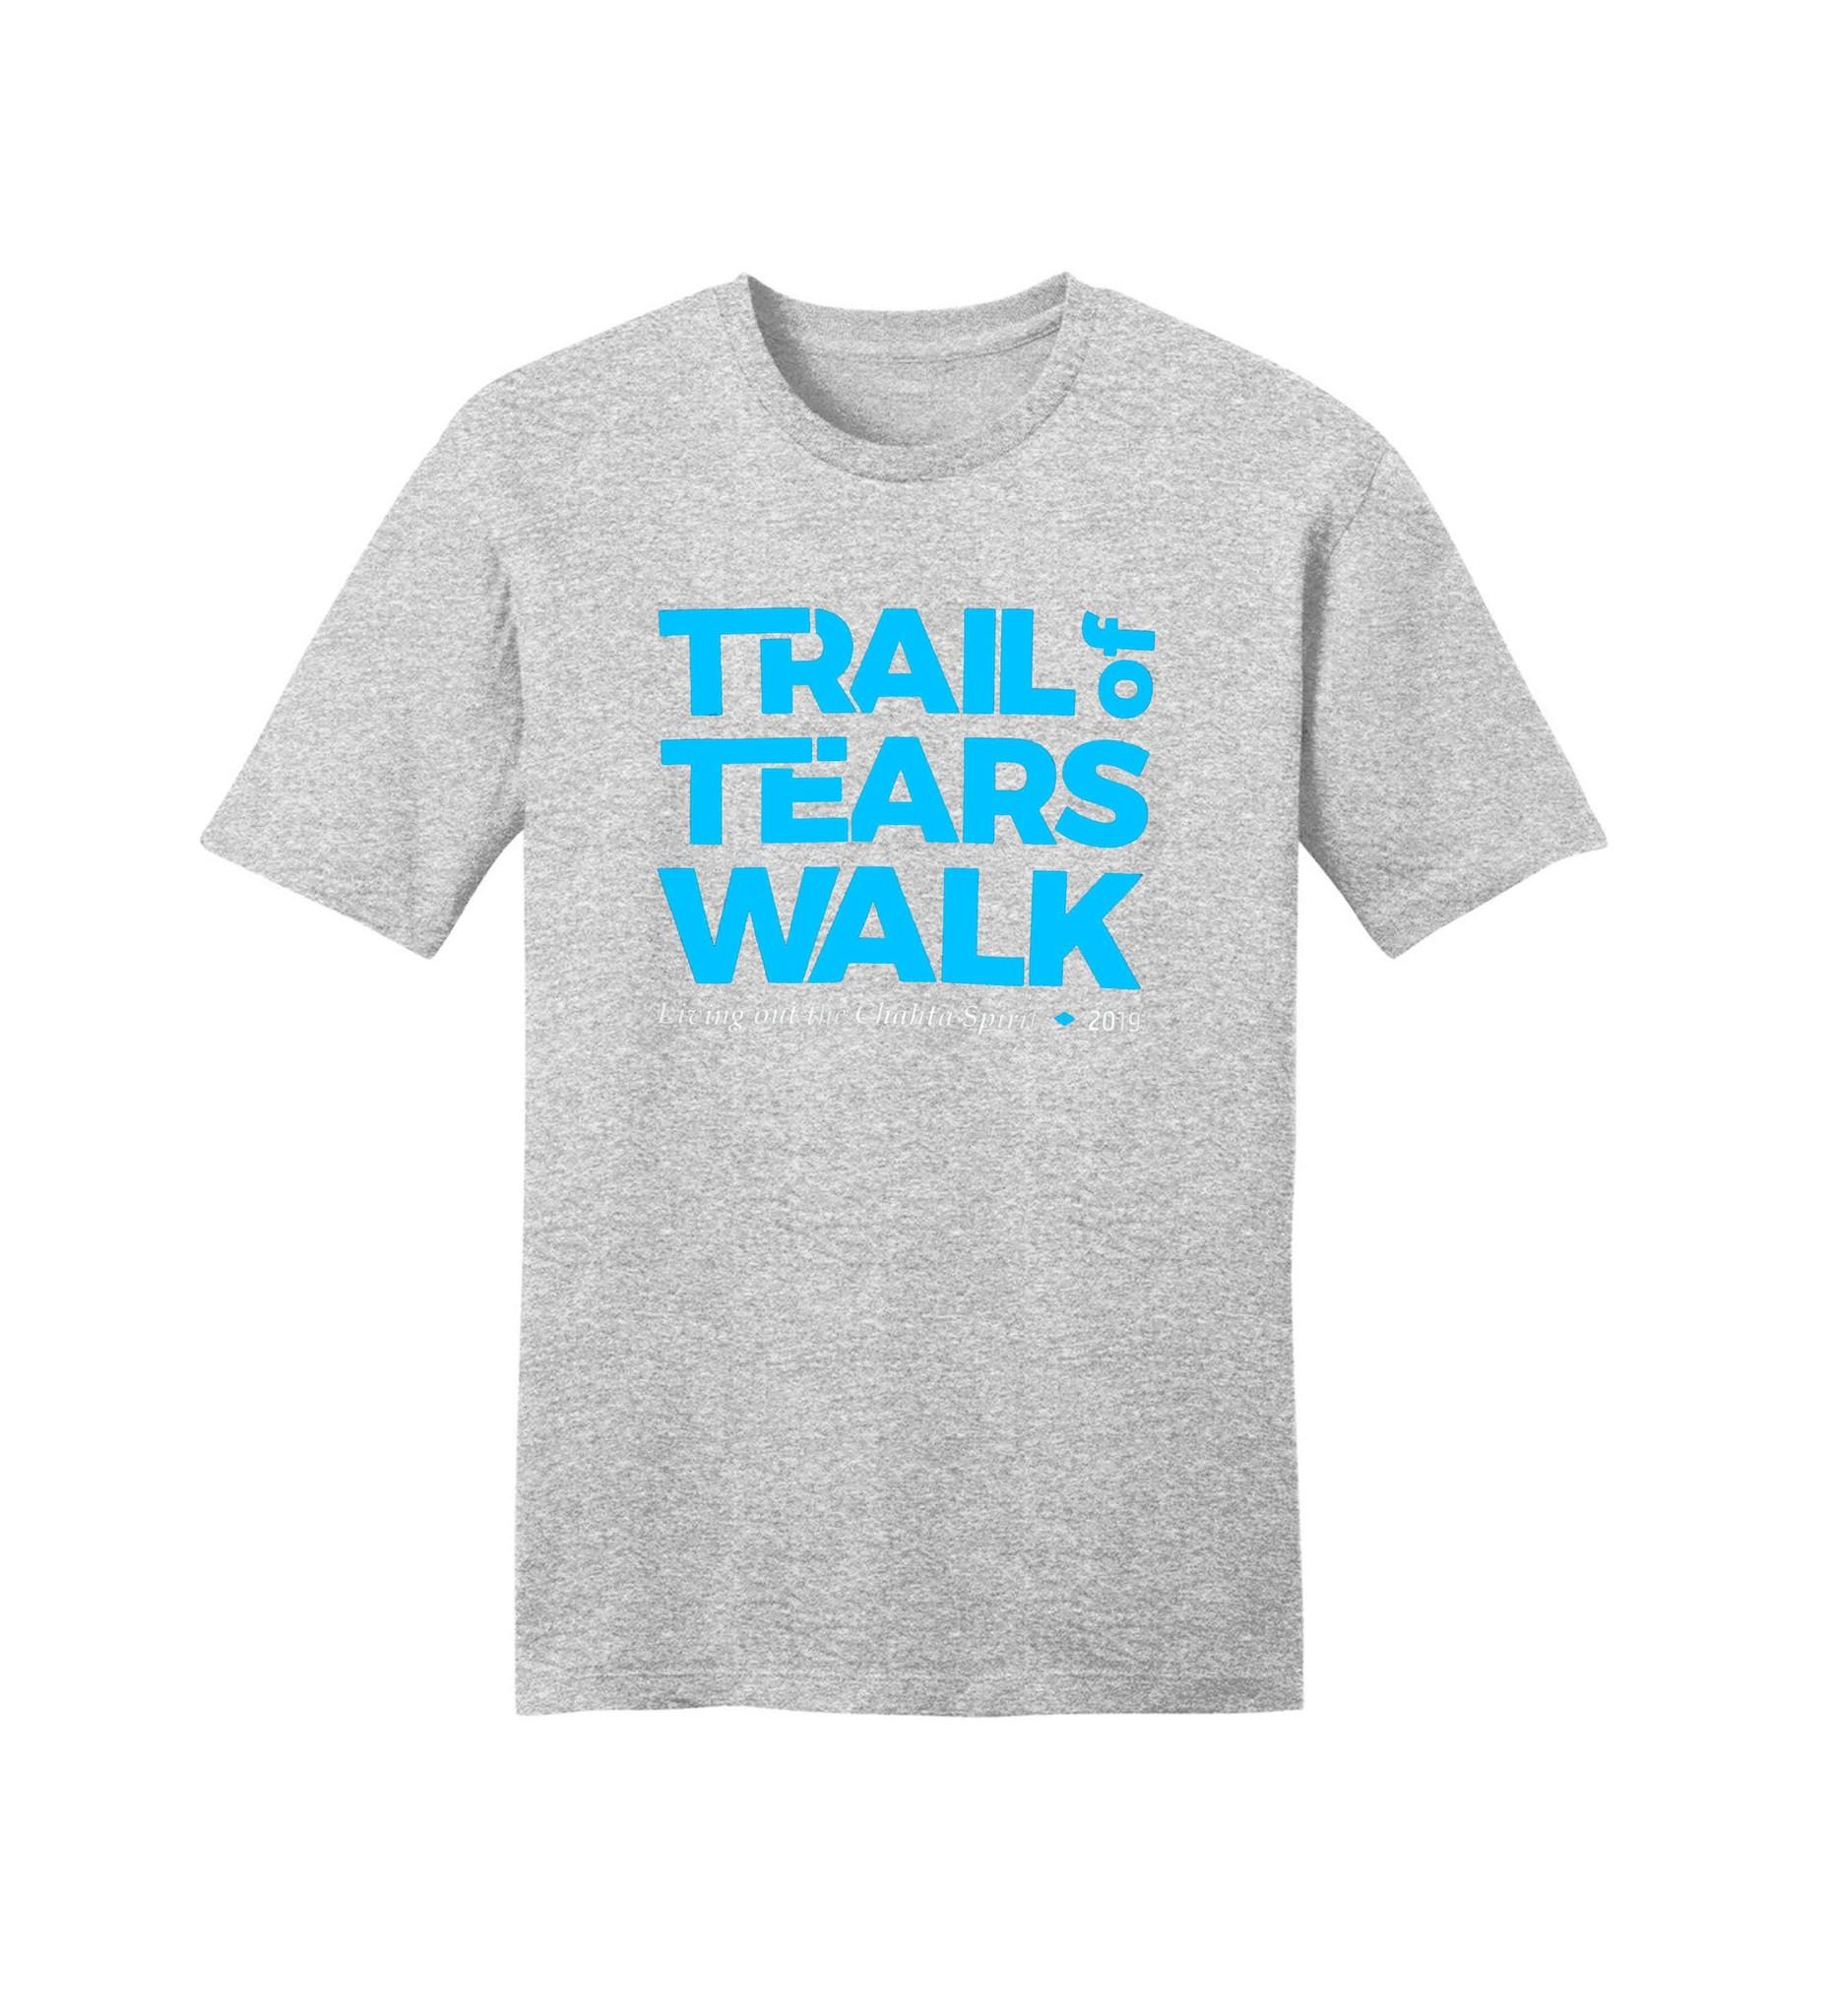 Trail of Tears Shirts 2019